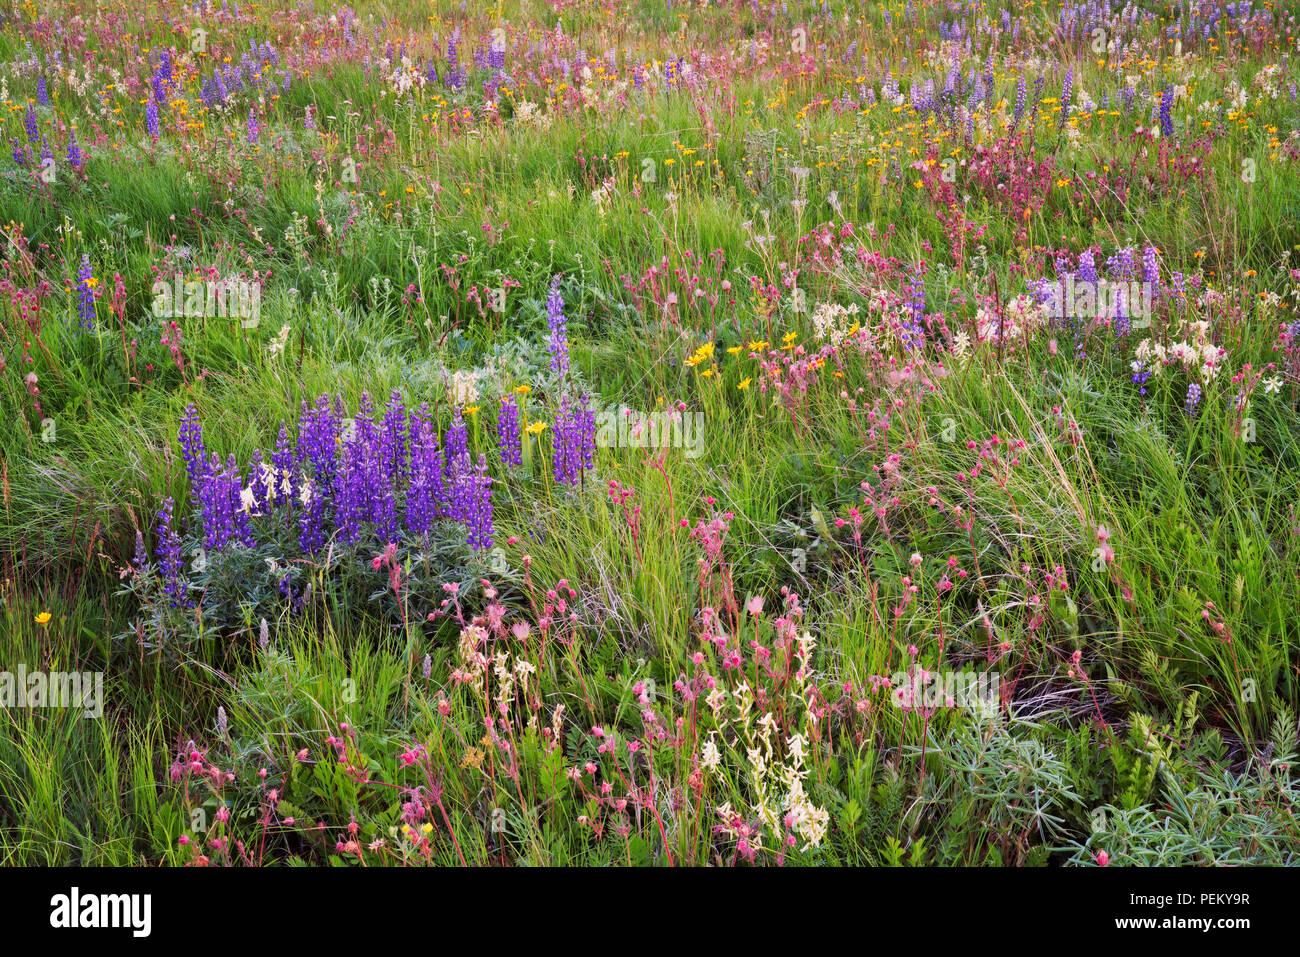 Blooming wildflowers including red Prairie Smoke, purple Lupine, and yellow Oregon Sunshine carpet the Zumwalt Prairie in NE Oregon's Wallowa County. - Stock Image